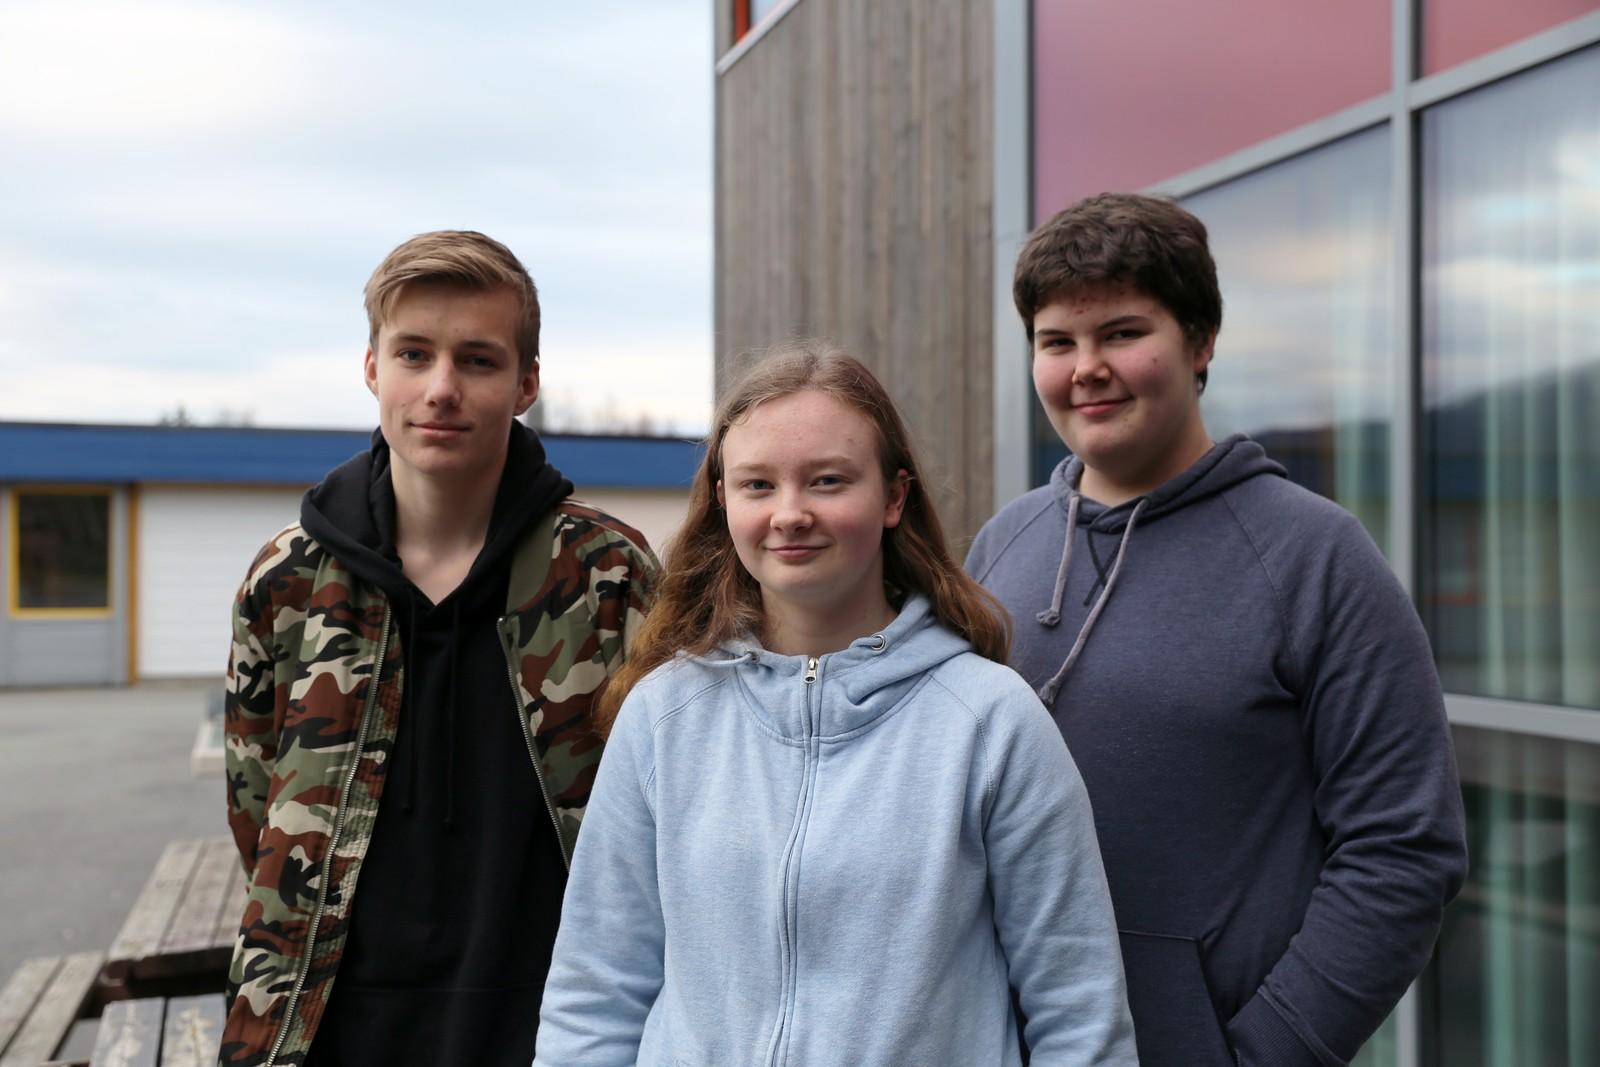 8 POENG: Rosendal ungdomsskule sine representanter, f.v: Torstein Olsen, Nora Mæland og Eirik Furuberg.